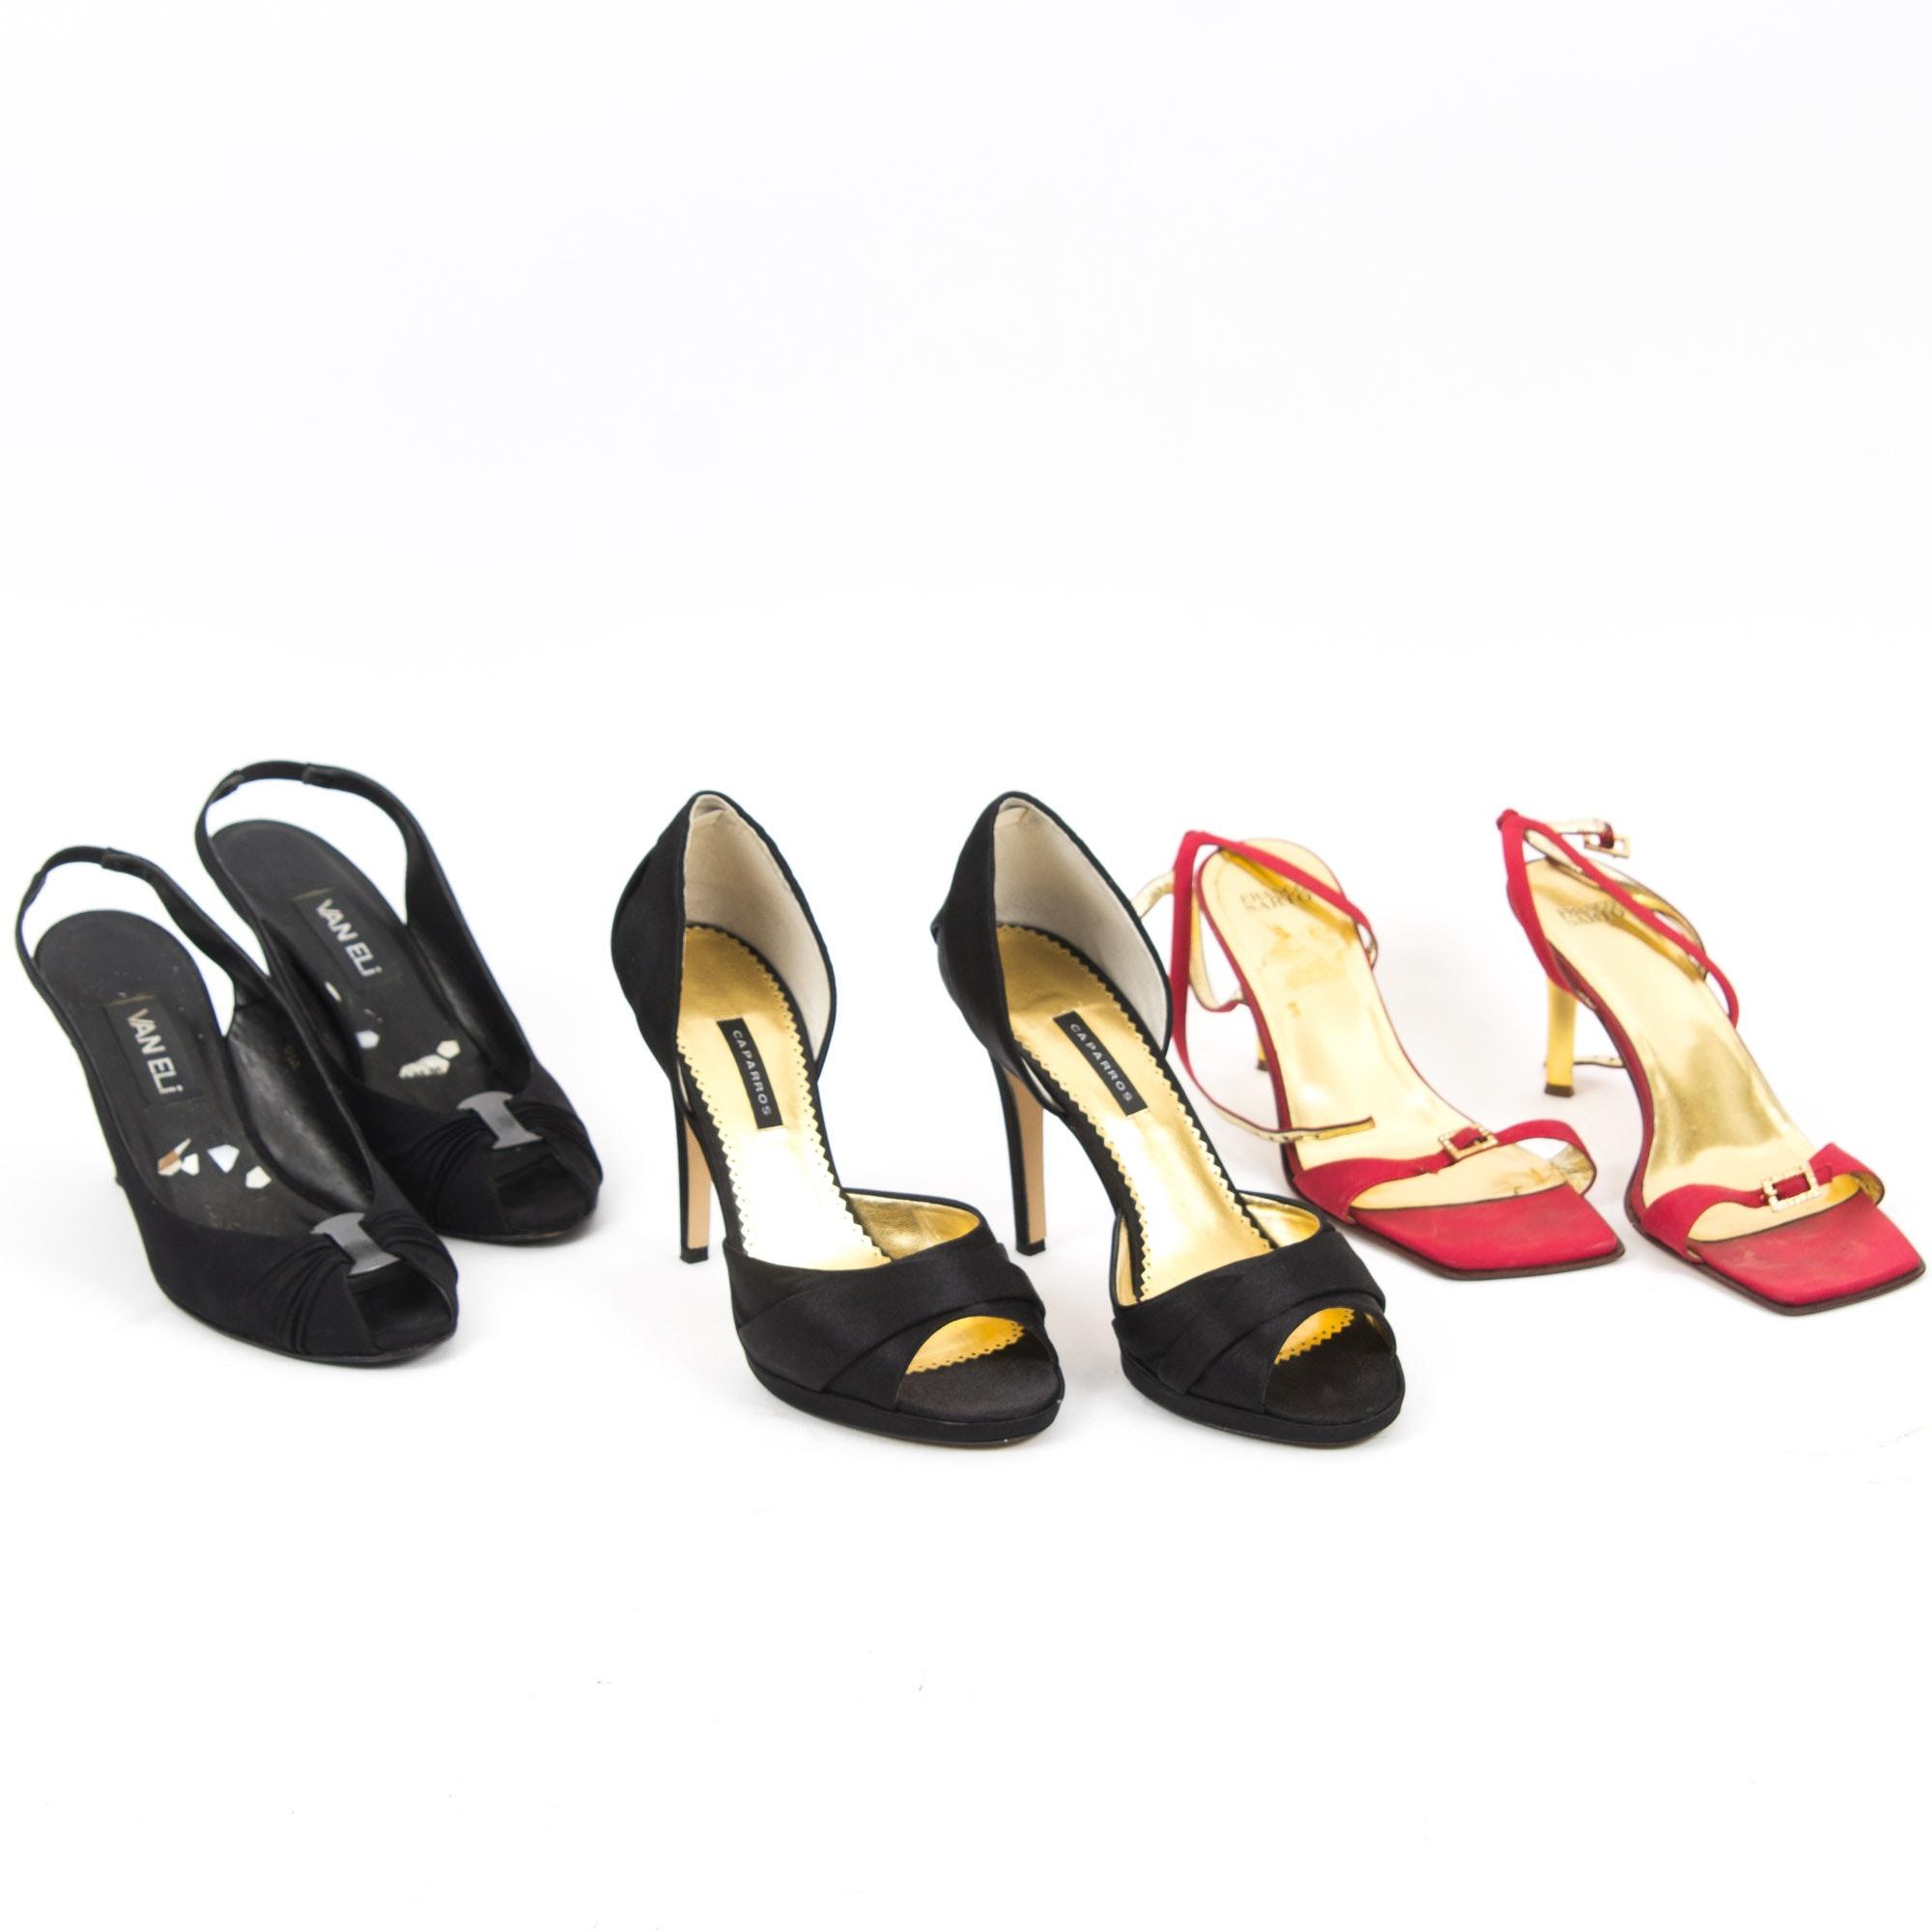 Three Pair of Designer Heels Including Charles David